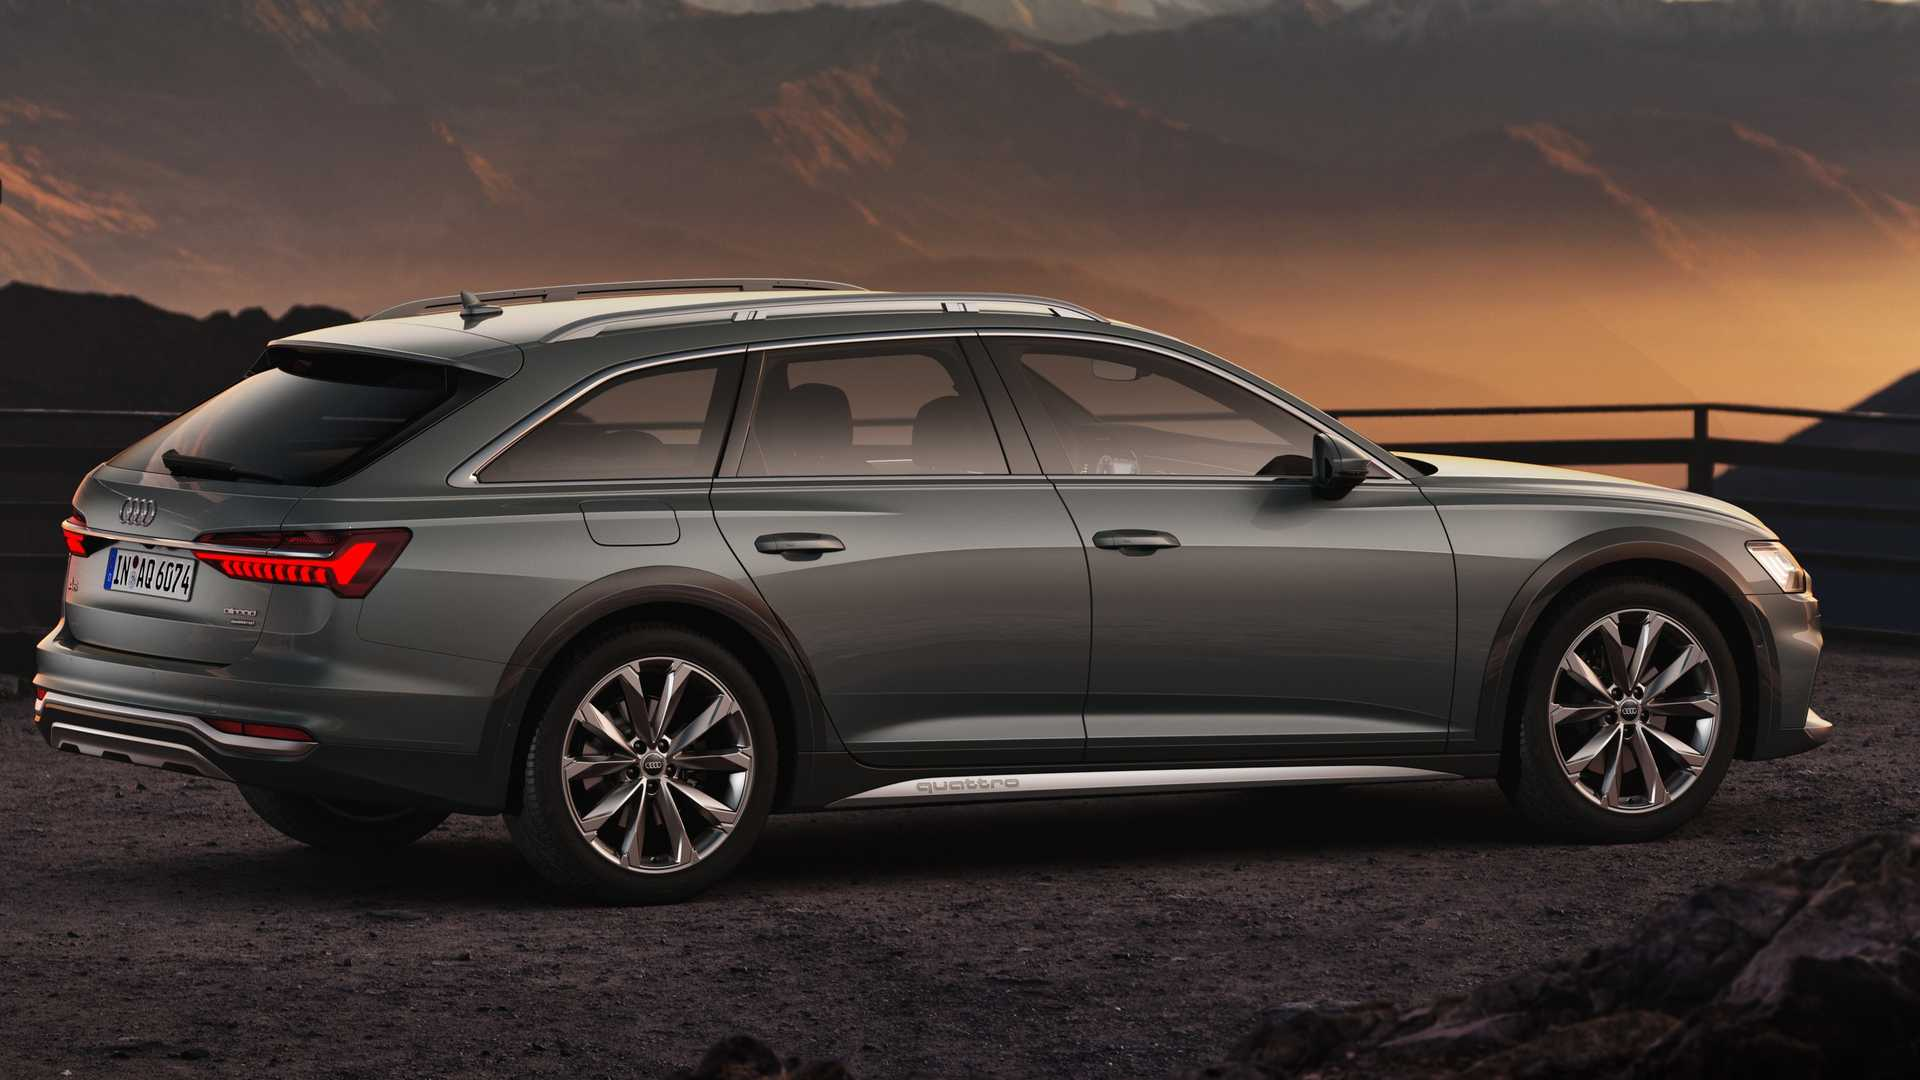 Kelebihan Kekurangan Audi Allroad Review